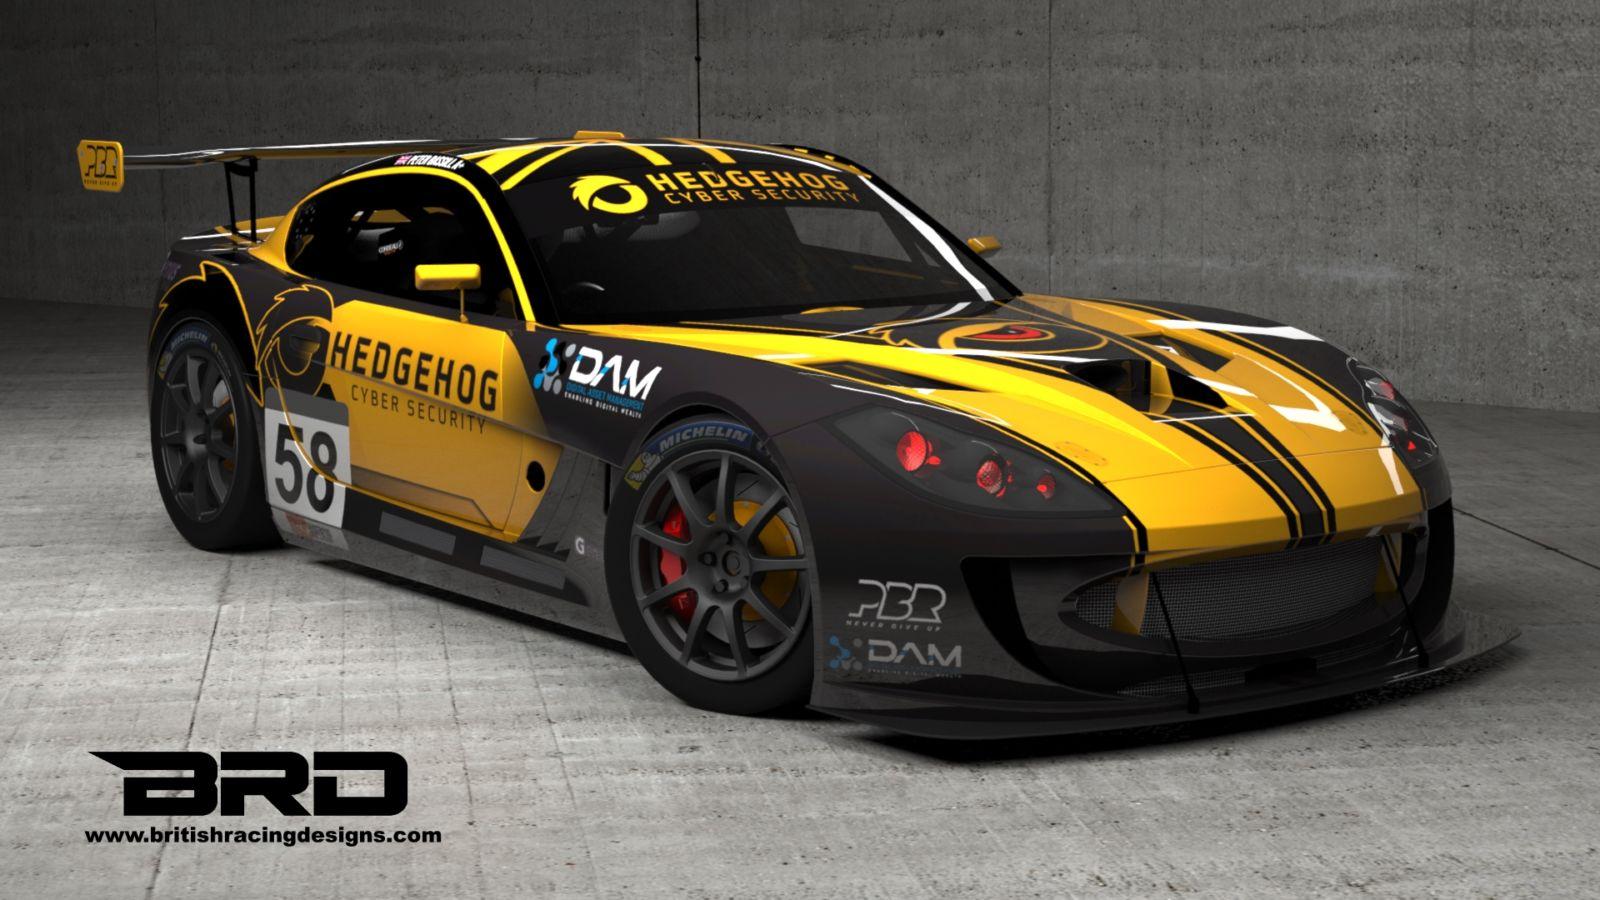 DAM sponsors Peter Bassill Racing – Ginetta GT4 SuperCup